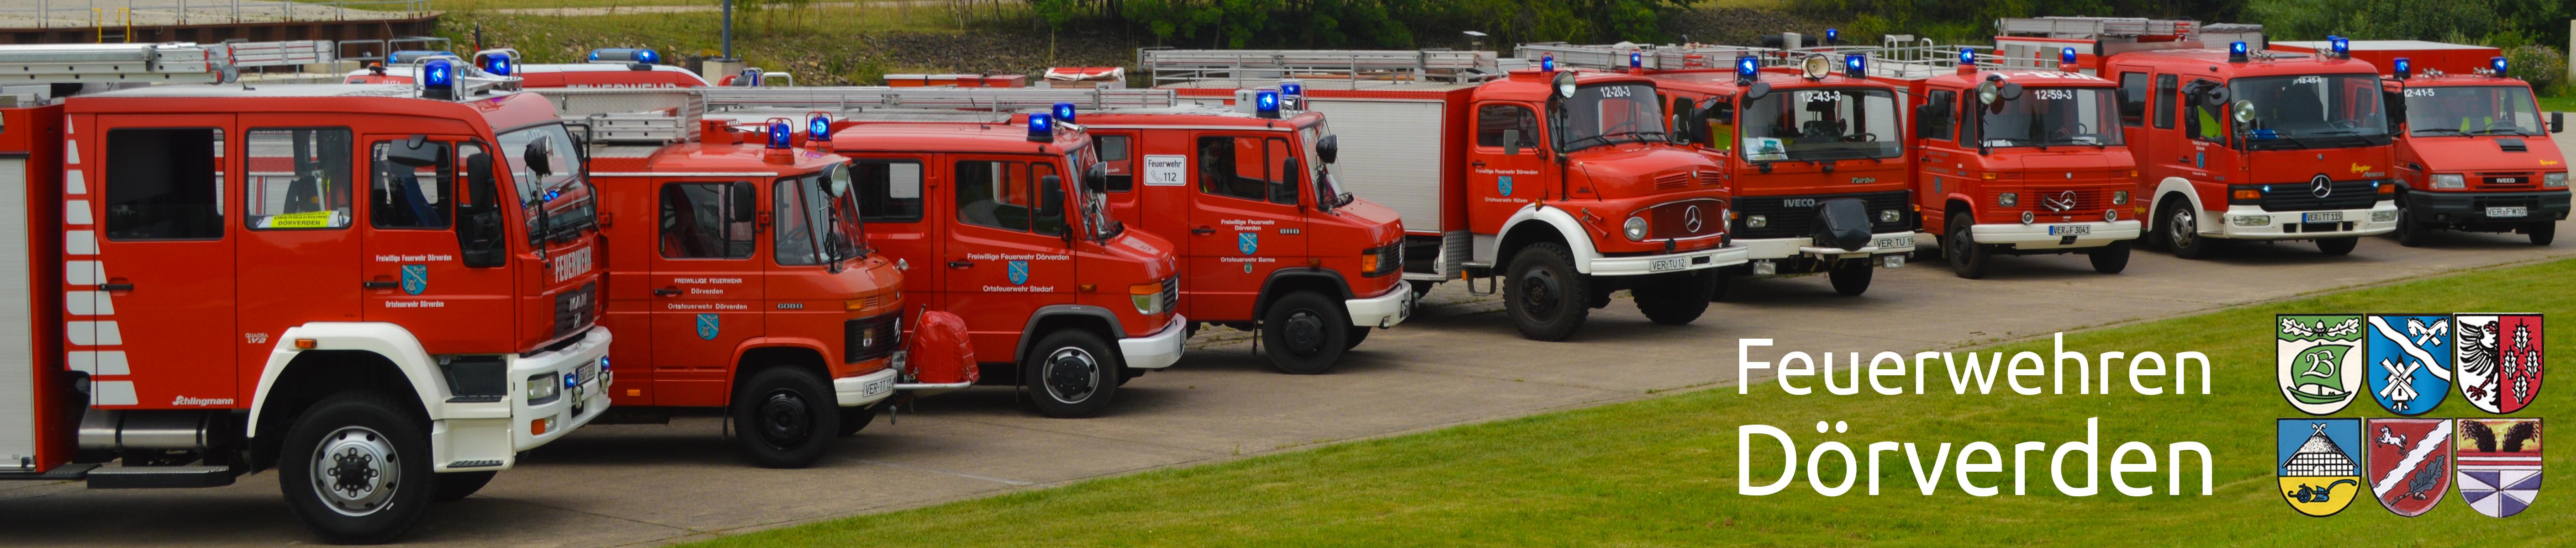 Freiwillige Feuerwehren Dörverden